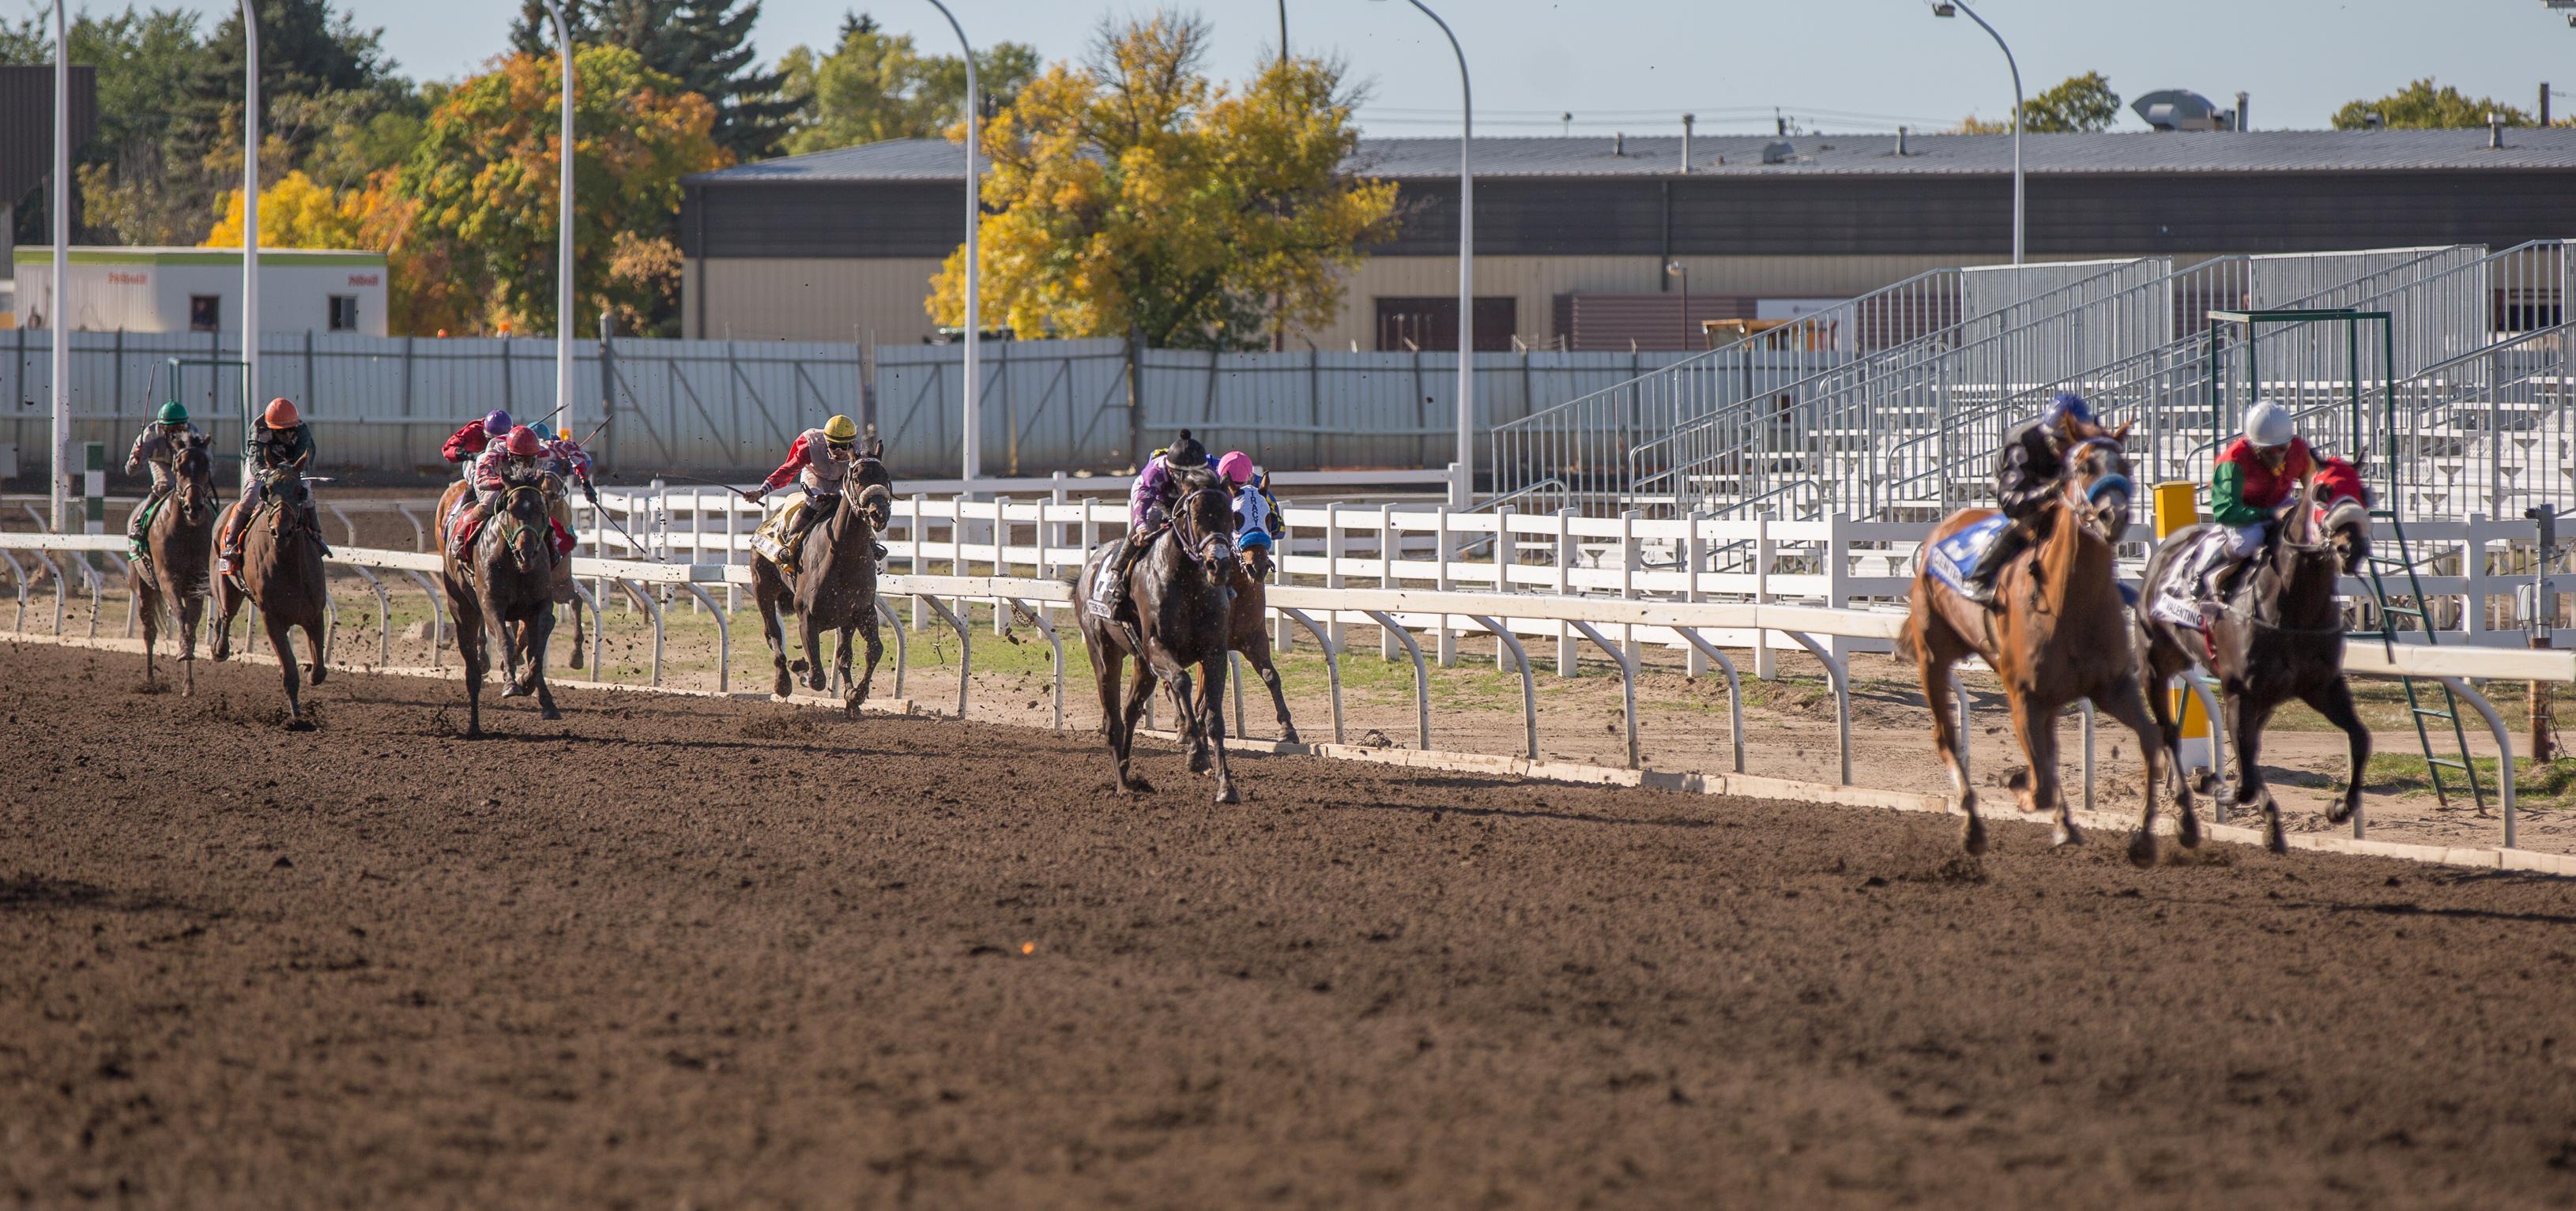 File:Alberta Breeders' Fall Classic 2014 - Horse Racing (15117958700 ...